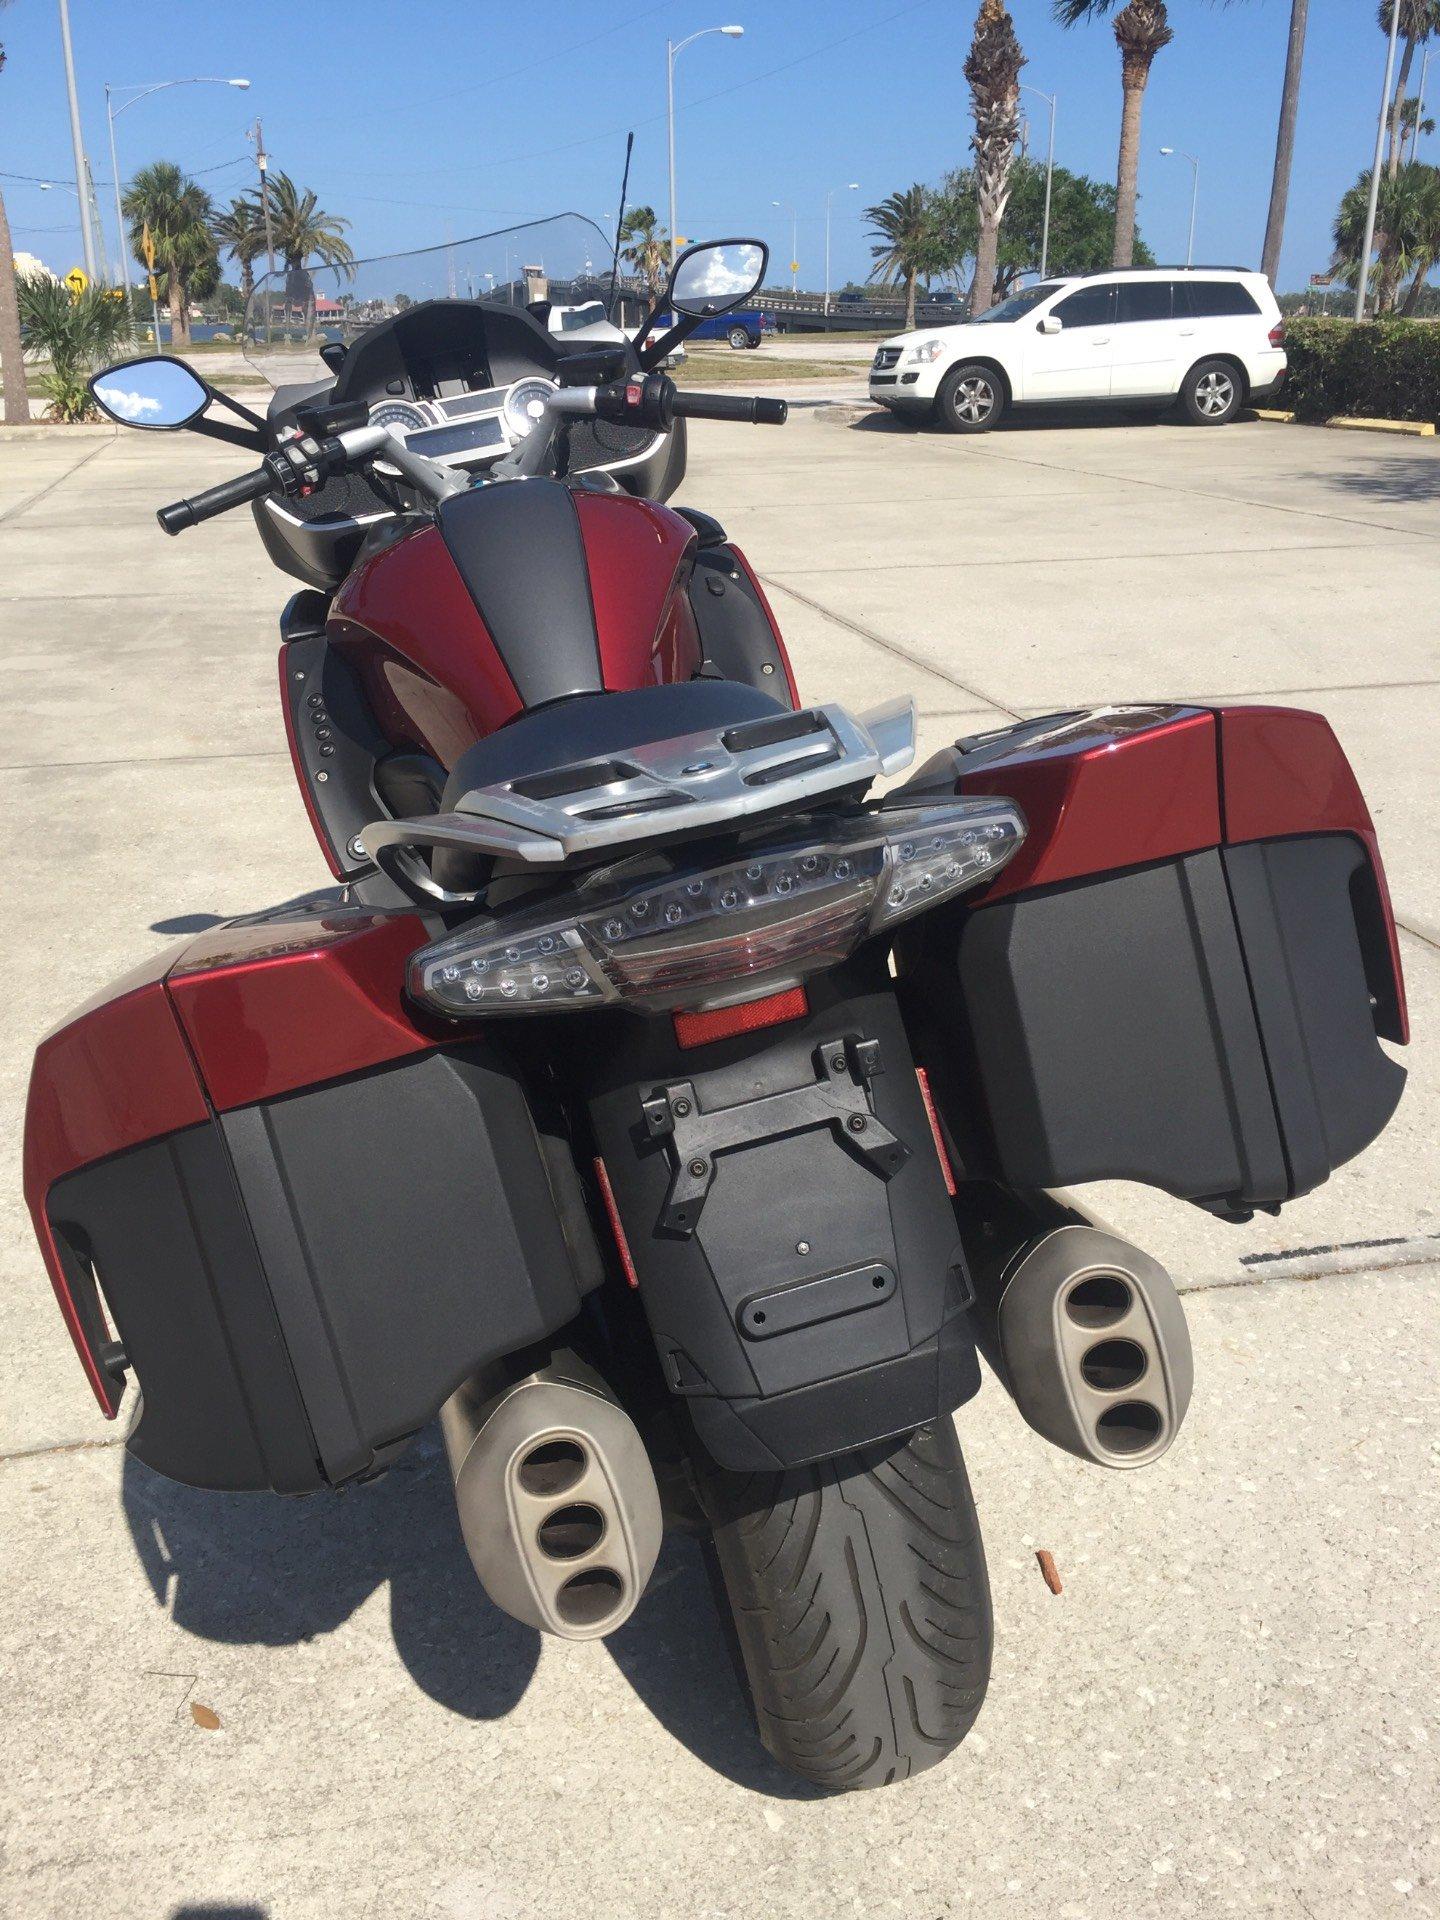 2012 BMW K 1600 GT in Daytona Beach, Florida